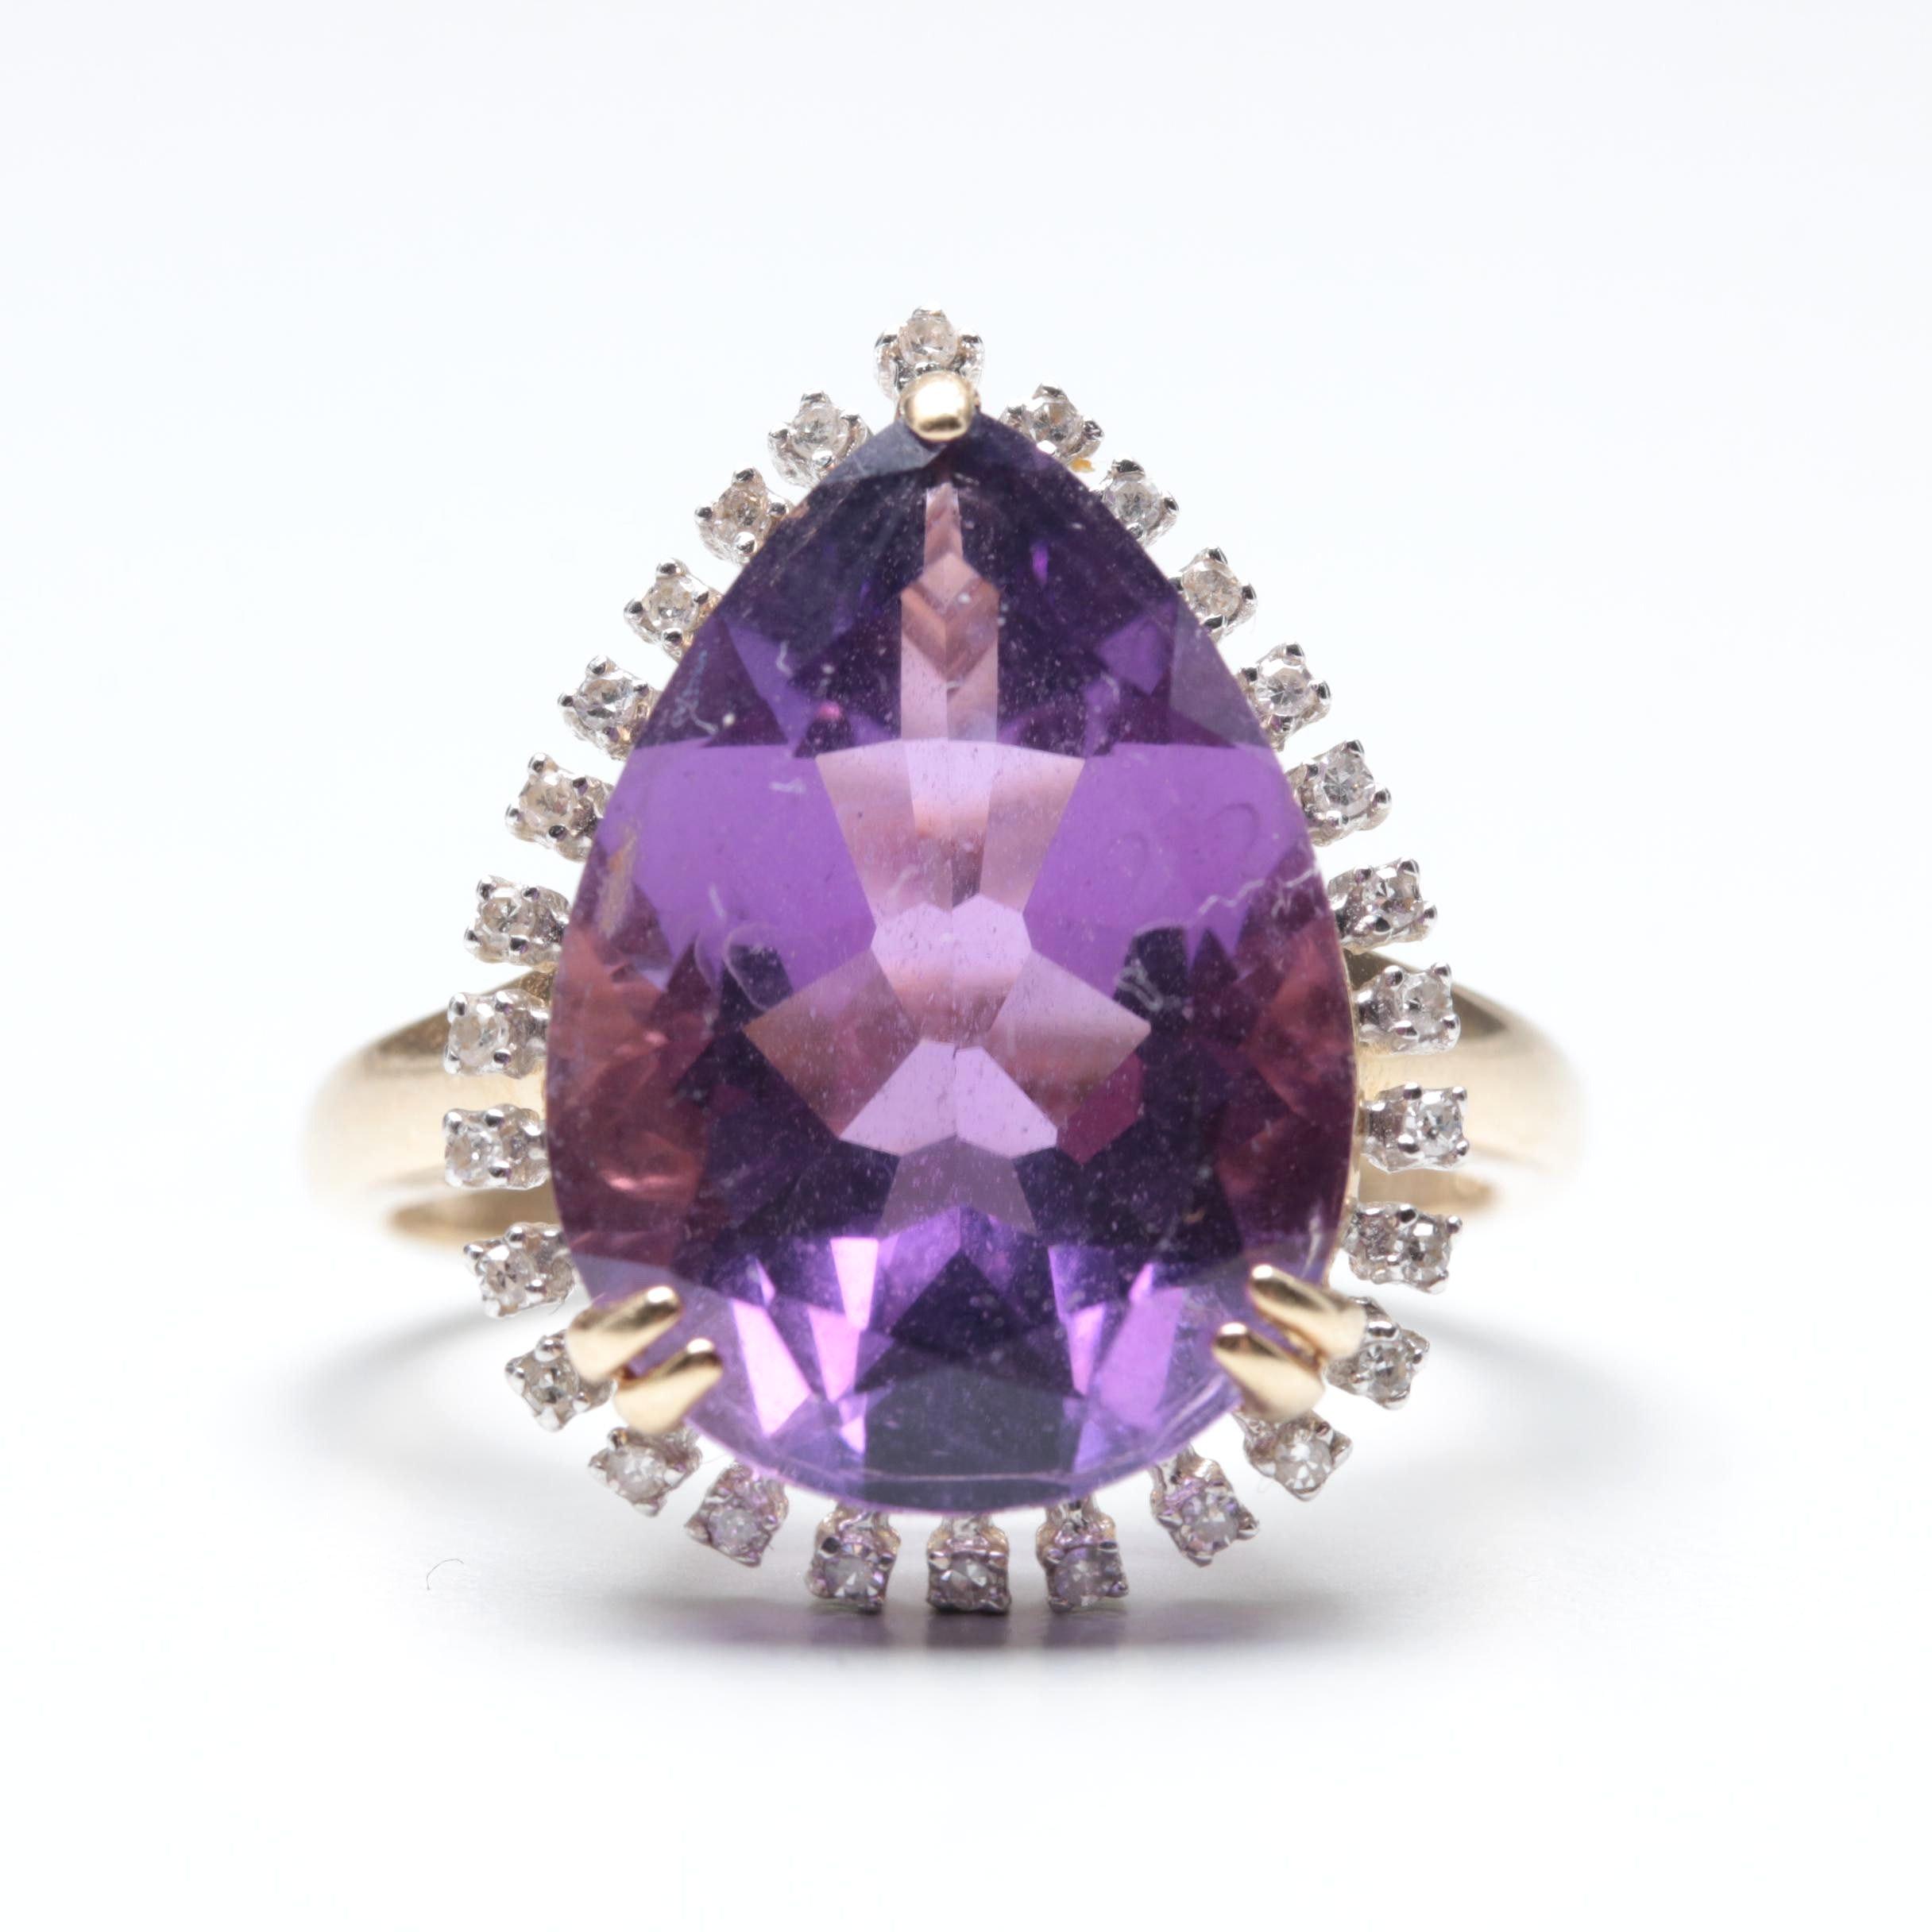 14K Yellow Gold 8.59 CT Amethyst and Diamond Ring